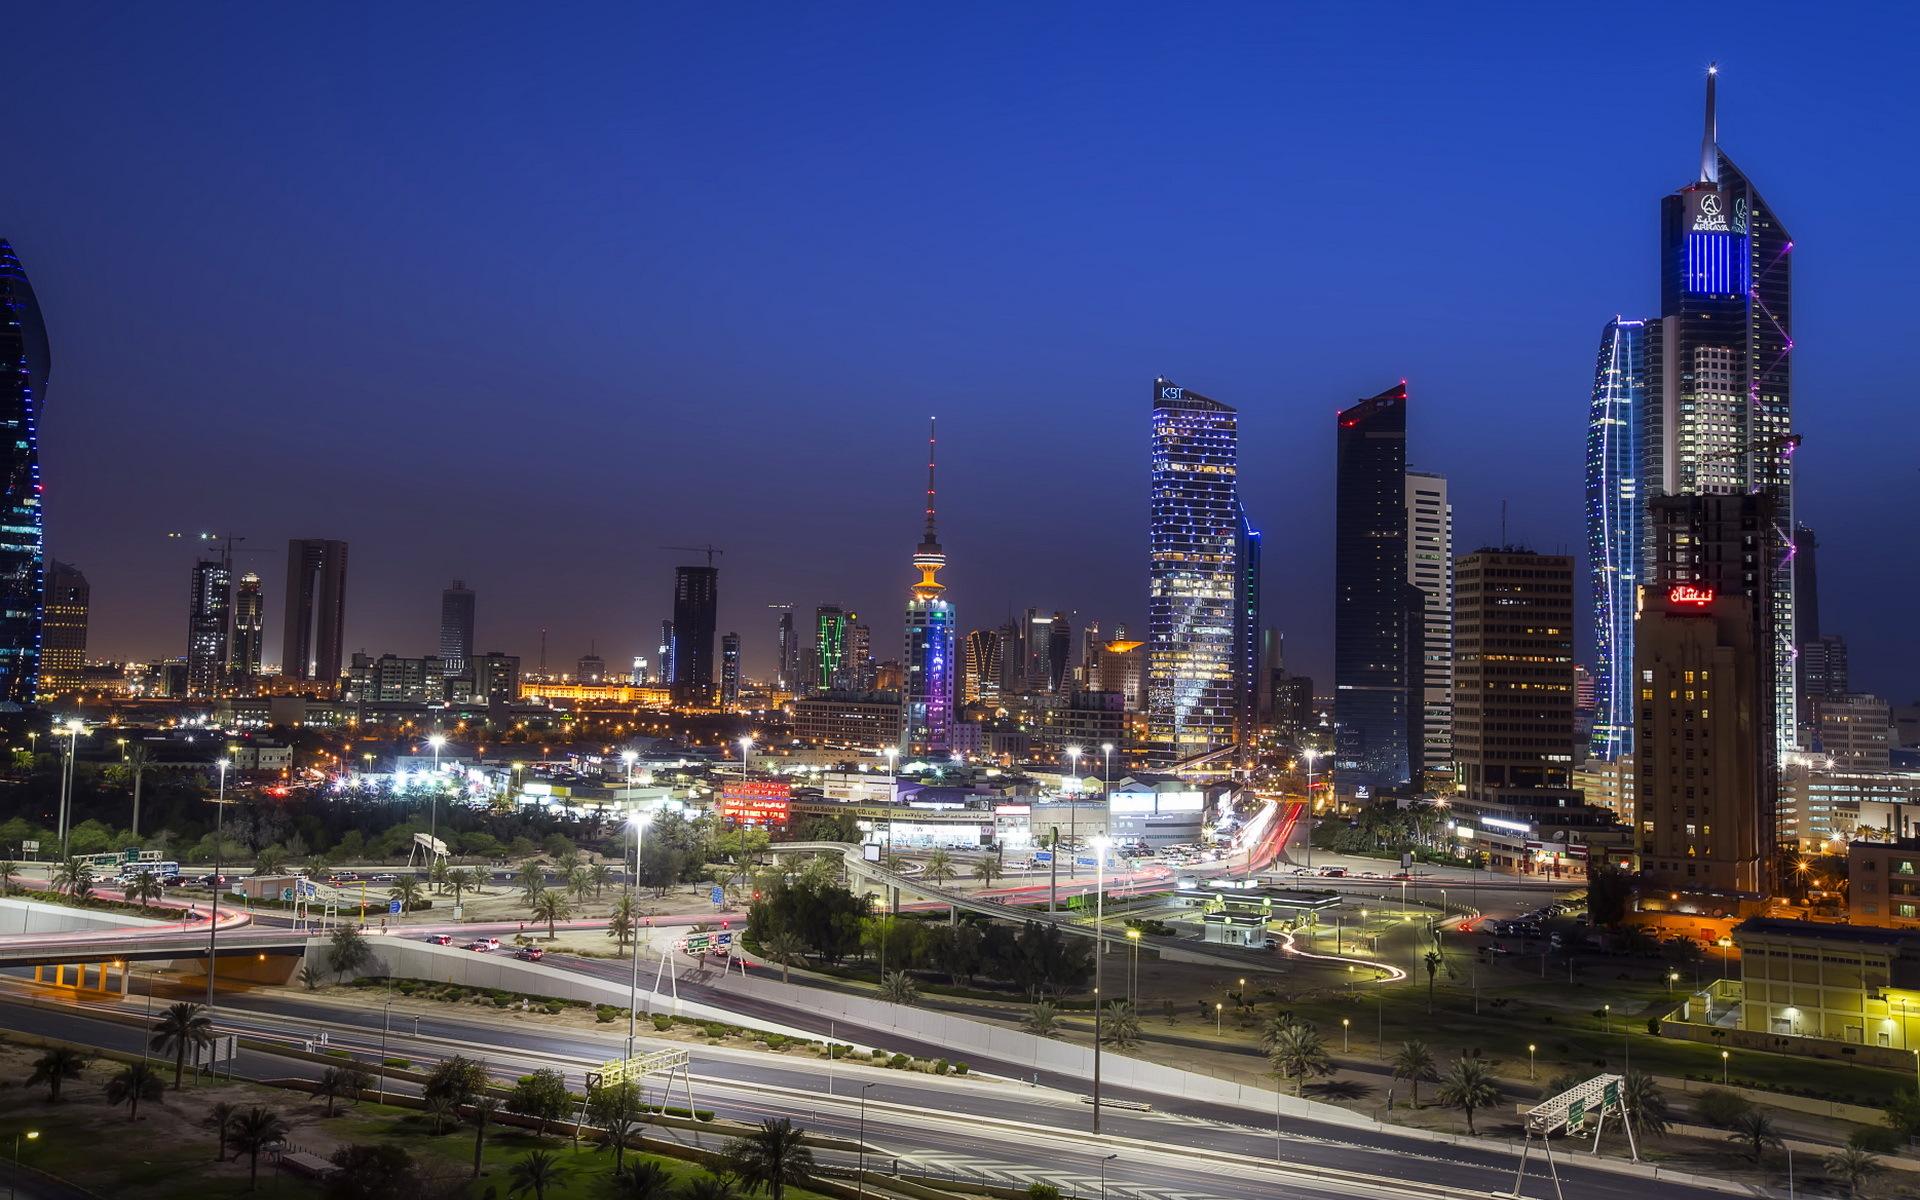 Íme Kuvait, innen jönnek Komlóra